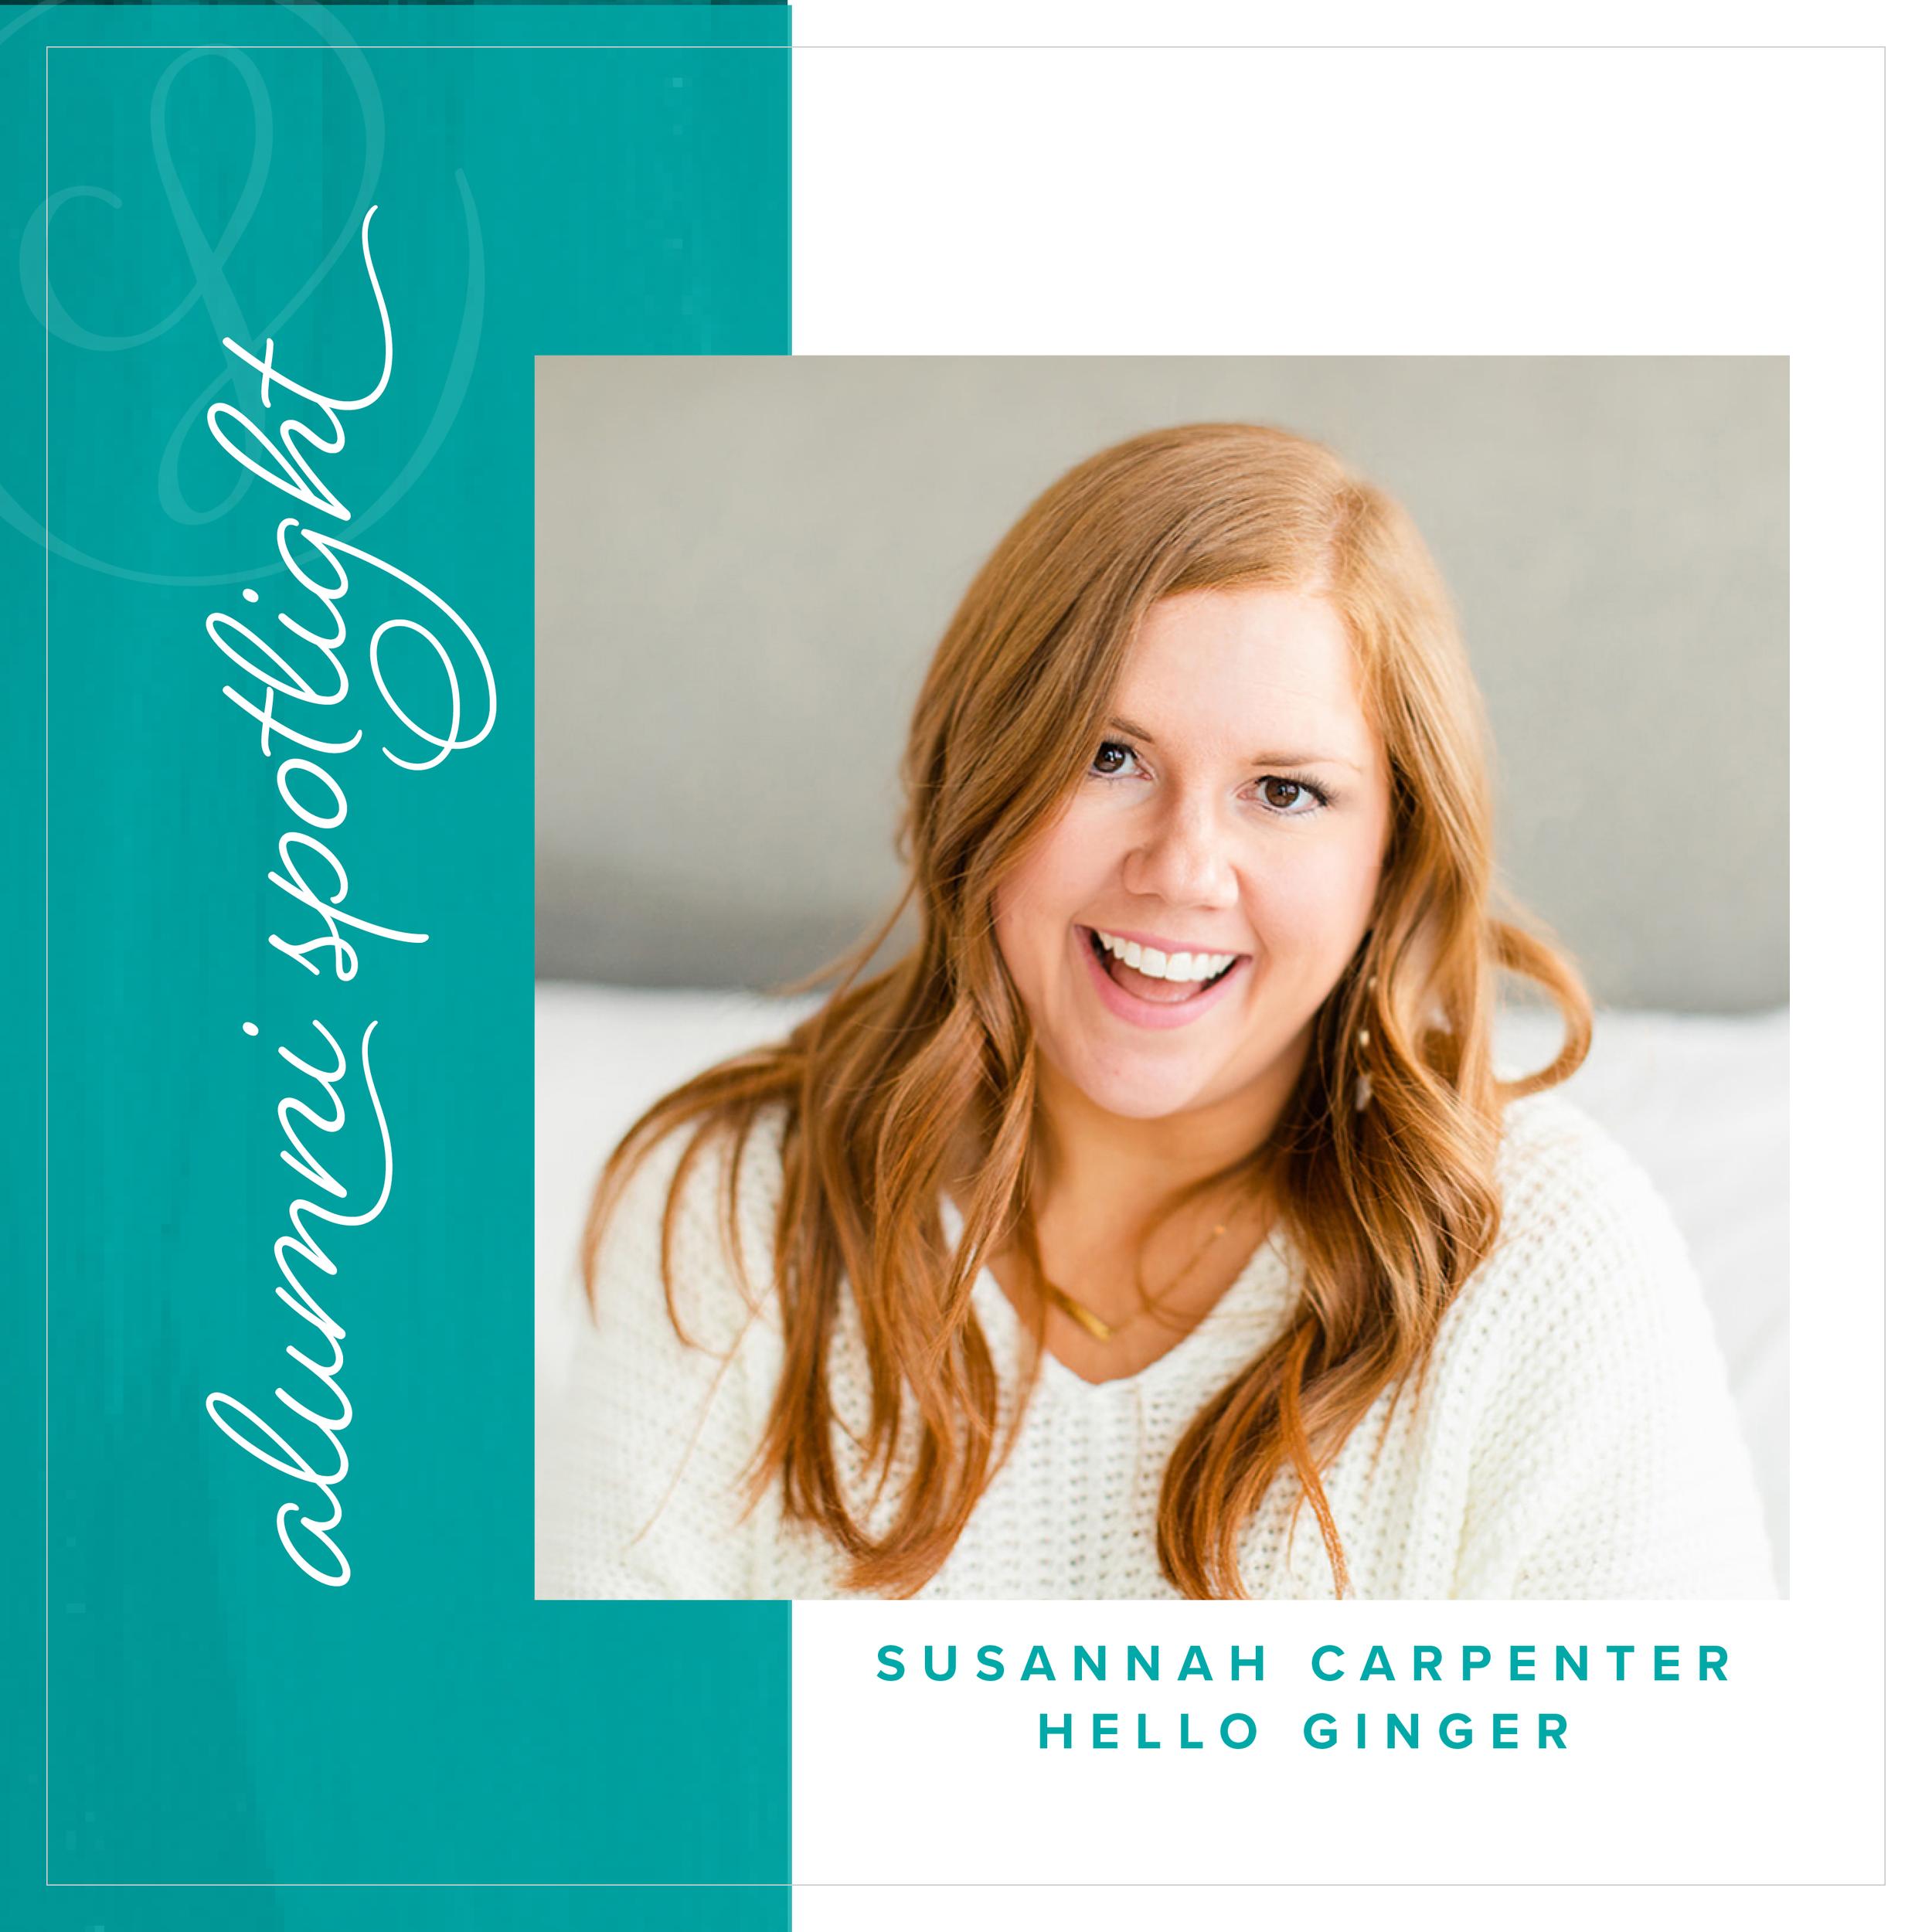 Susannah Carpenter of Hello Ginger - Alumni Spotlight for Society for Creative Founders